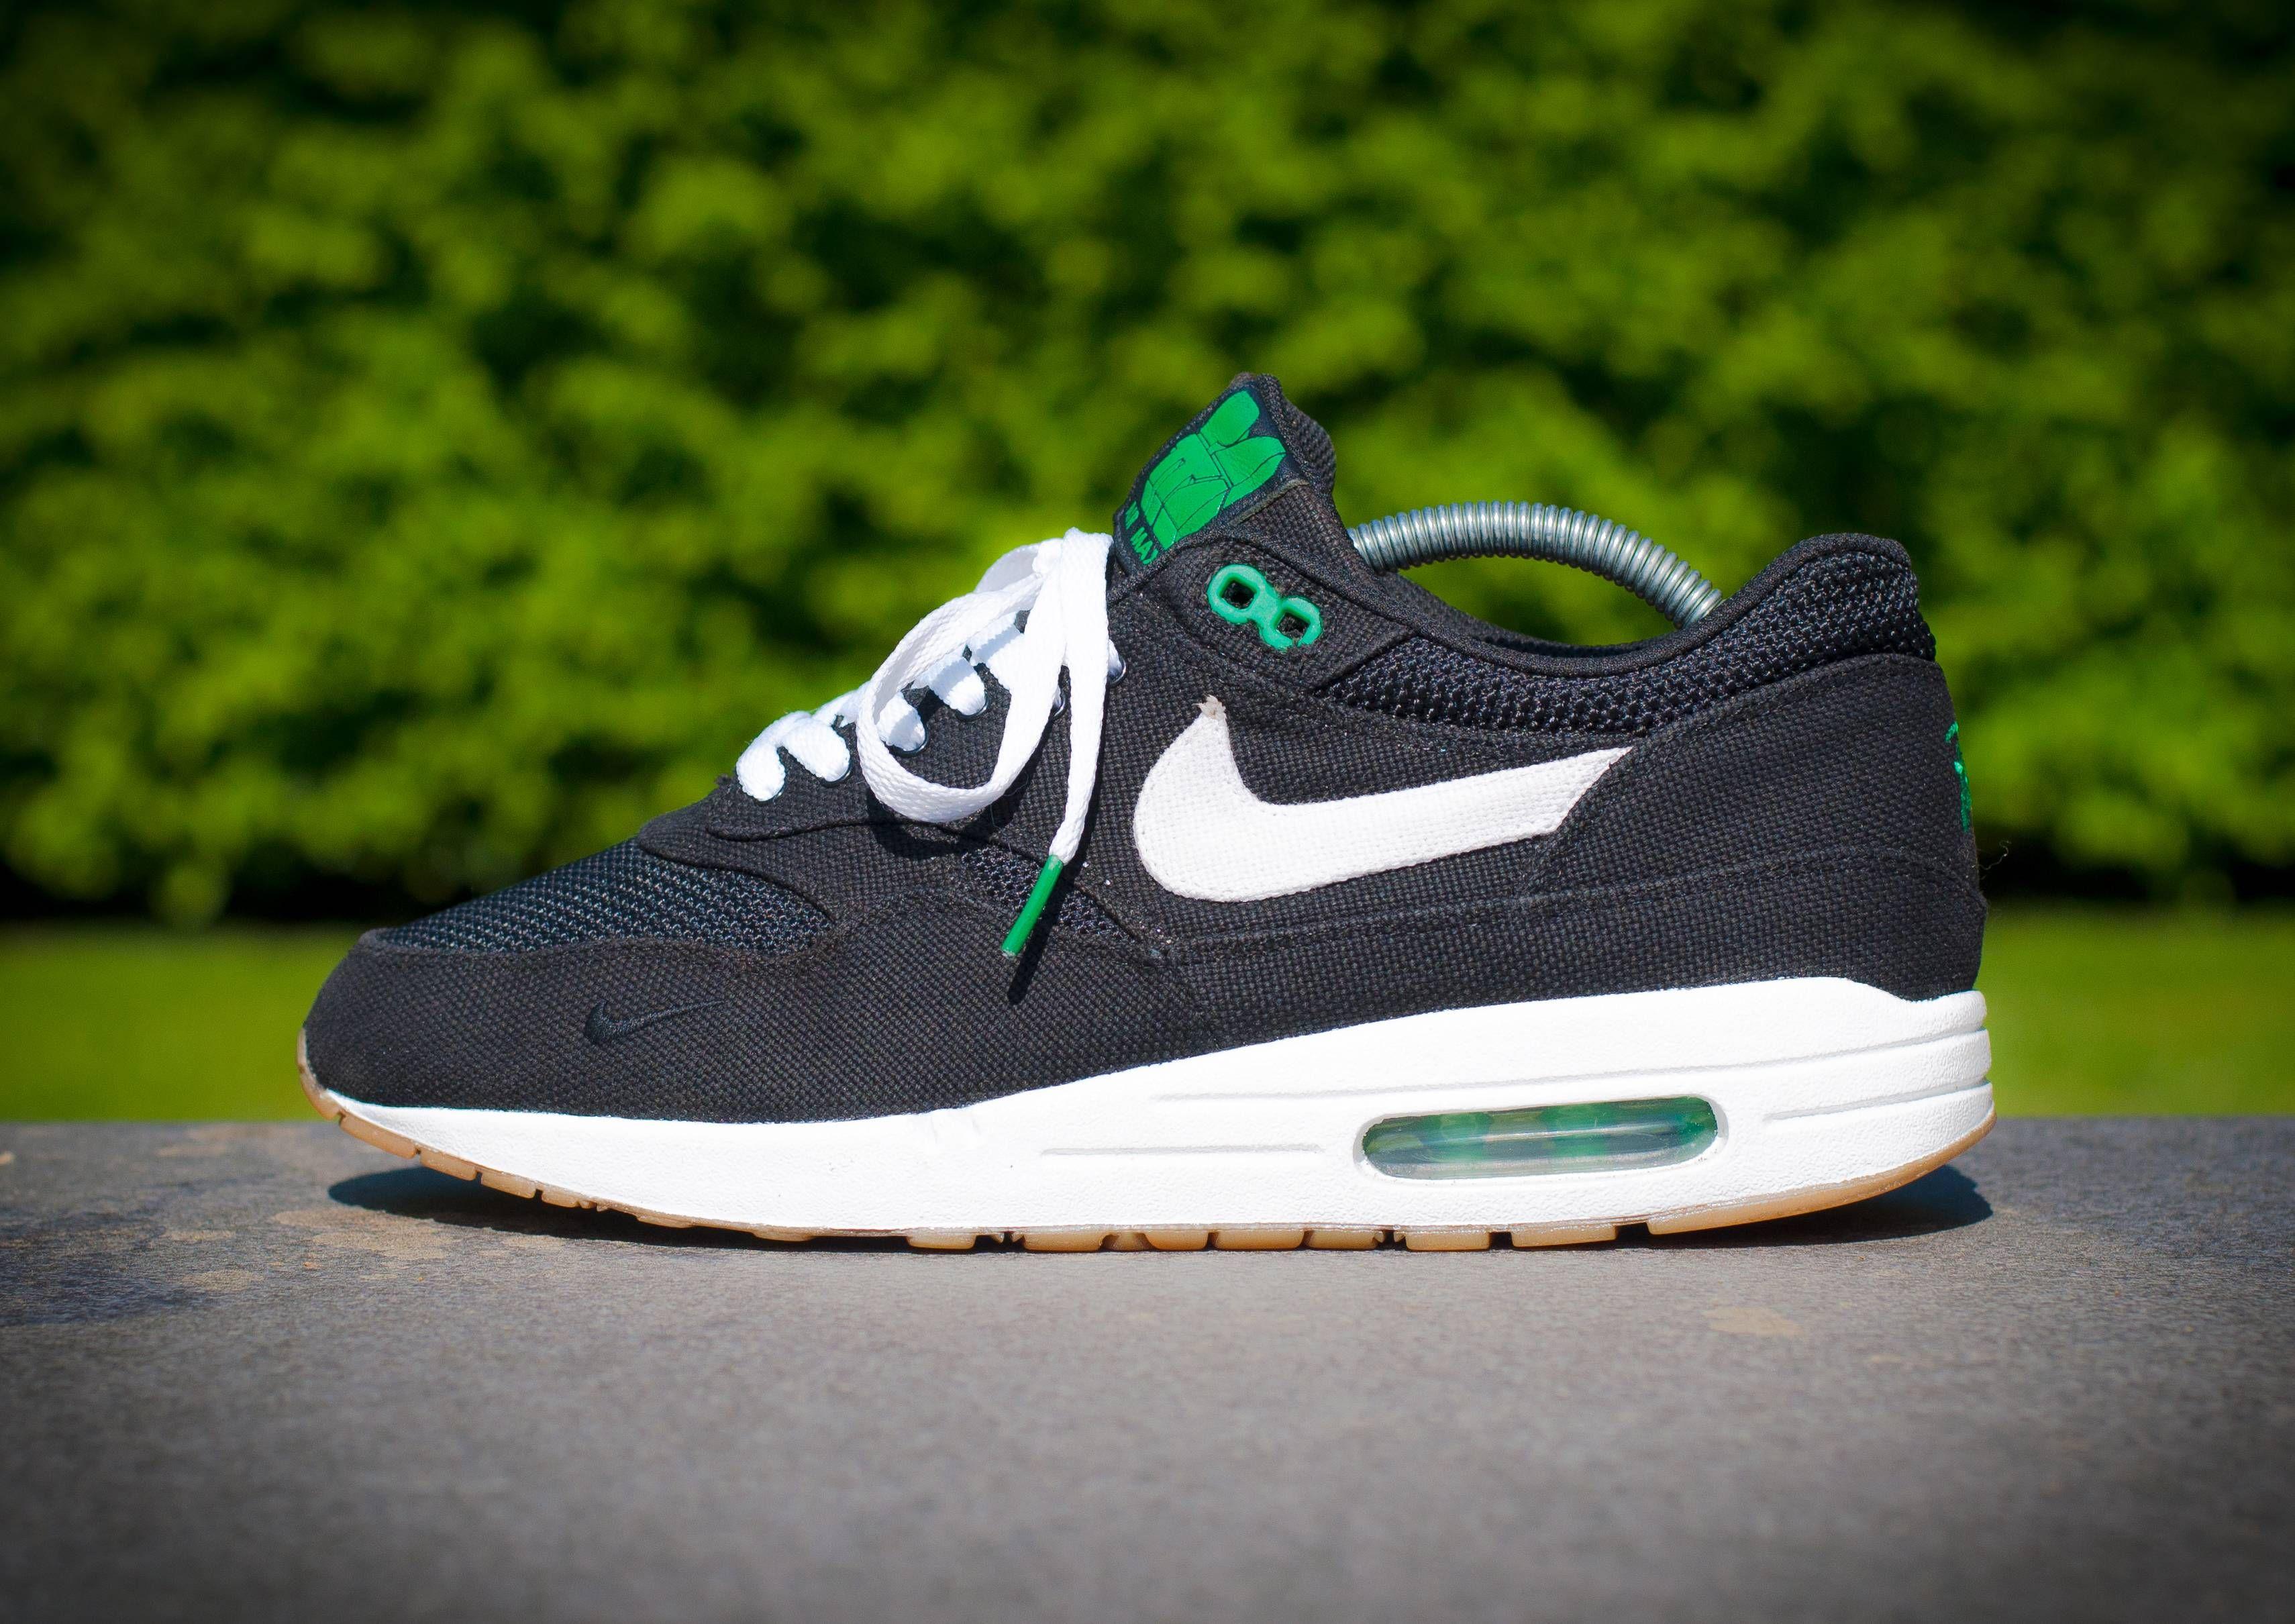 9edf02da82b2df Nike Air max 1 Patta Lucky Green by Dennis Wegereef